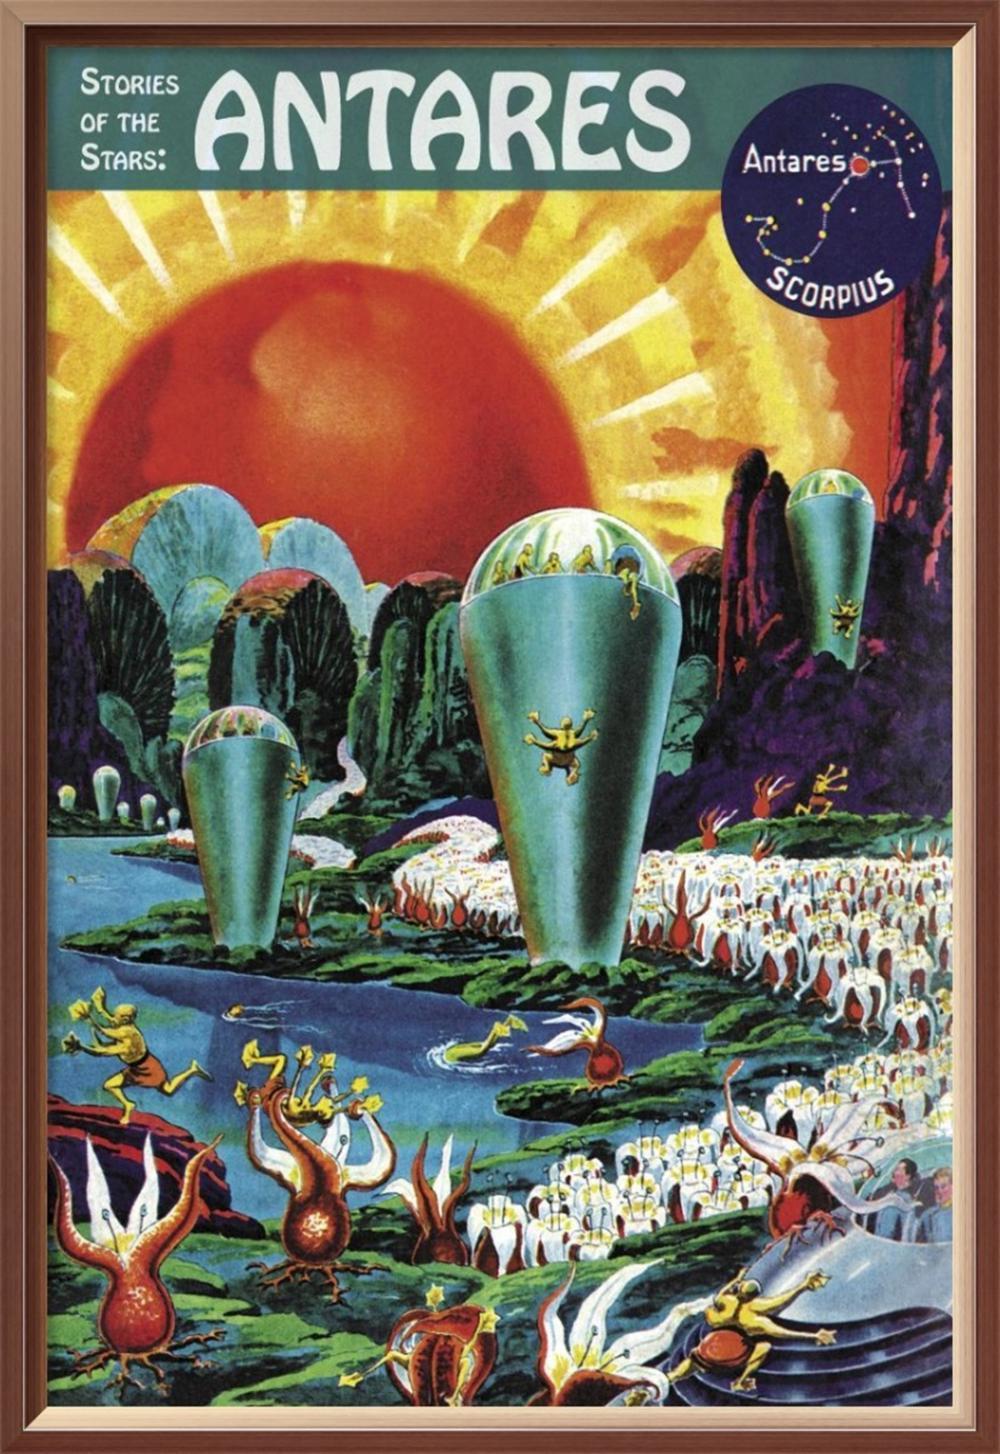 FRANK R. PAUL - RETROSCI-FI: STORIES OF THE STARS - ANTARES